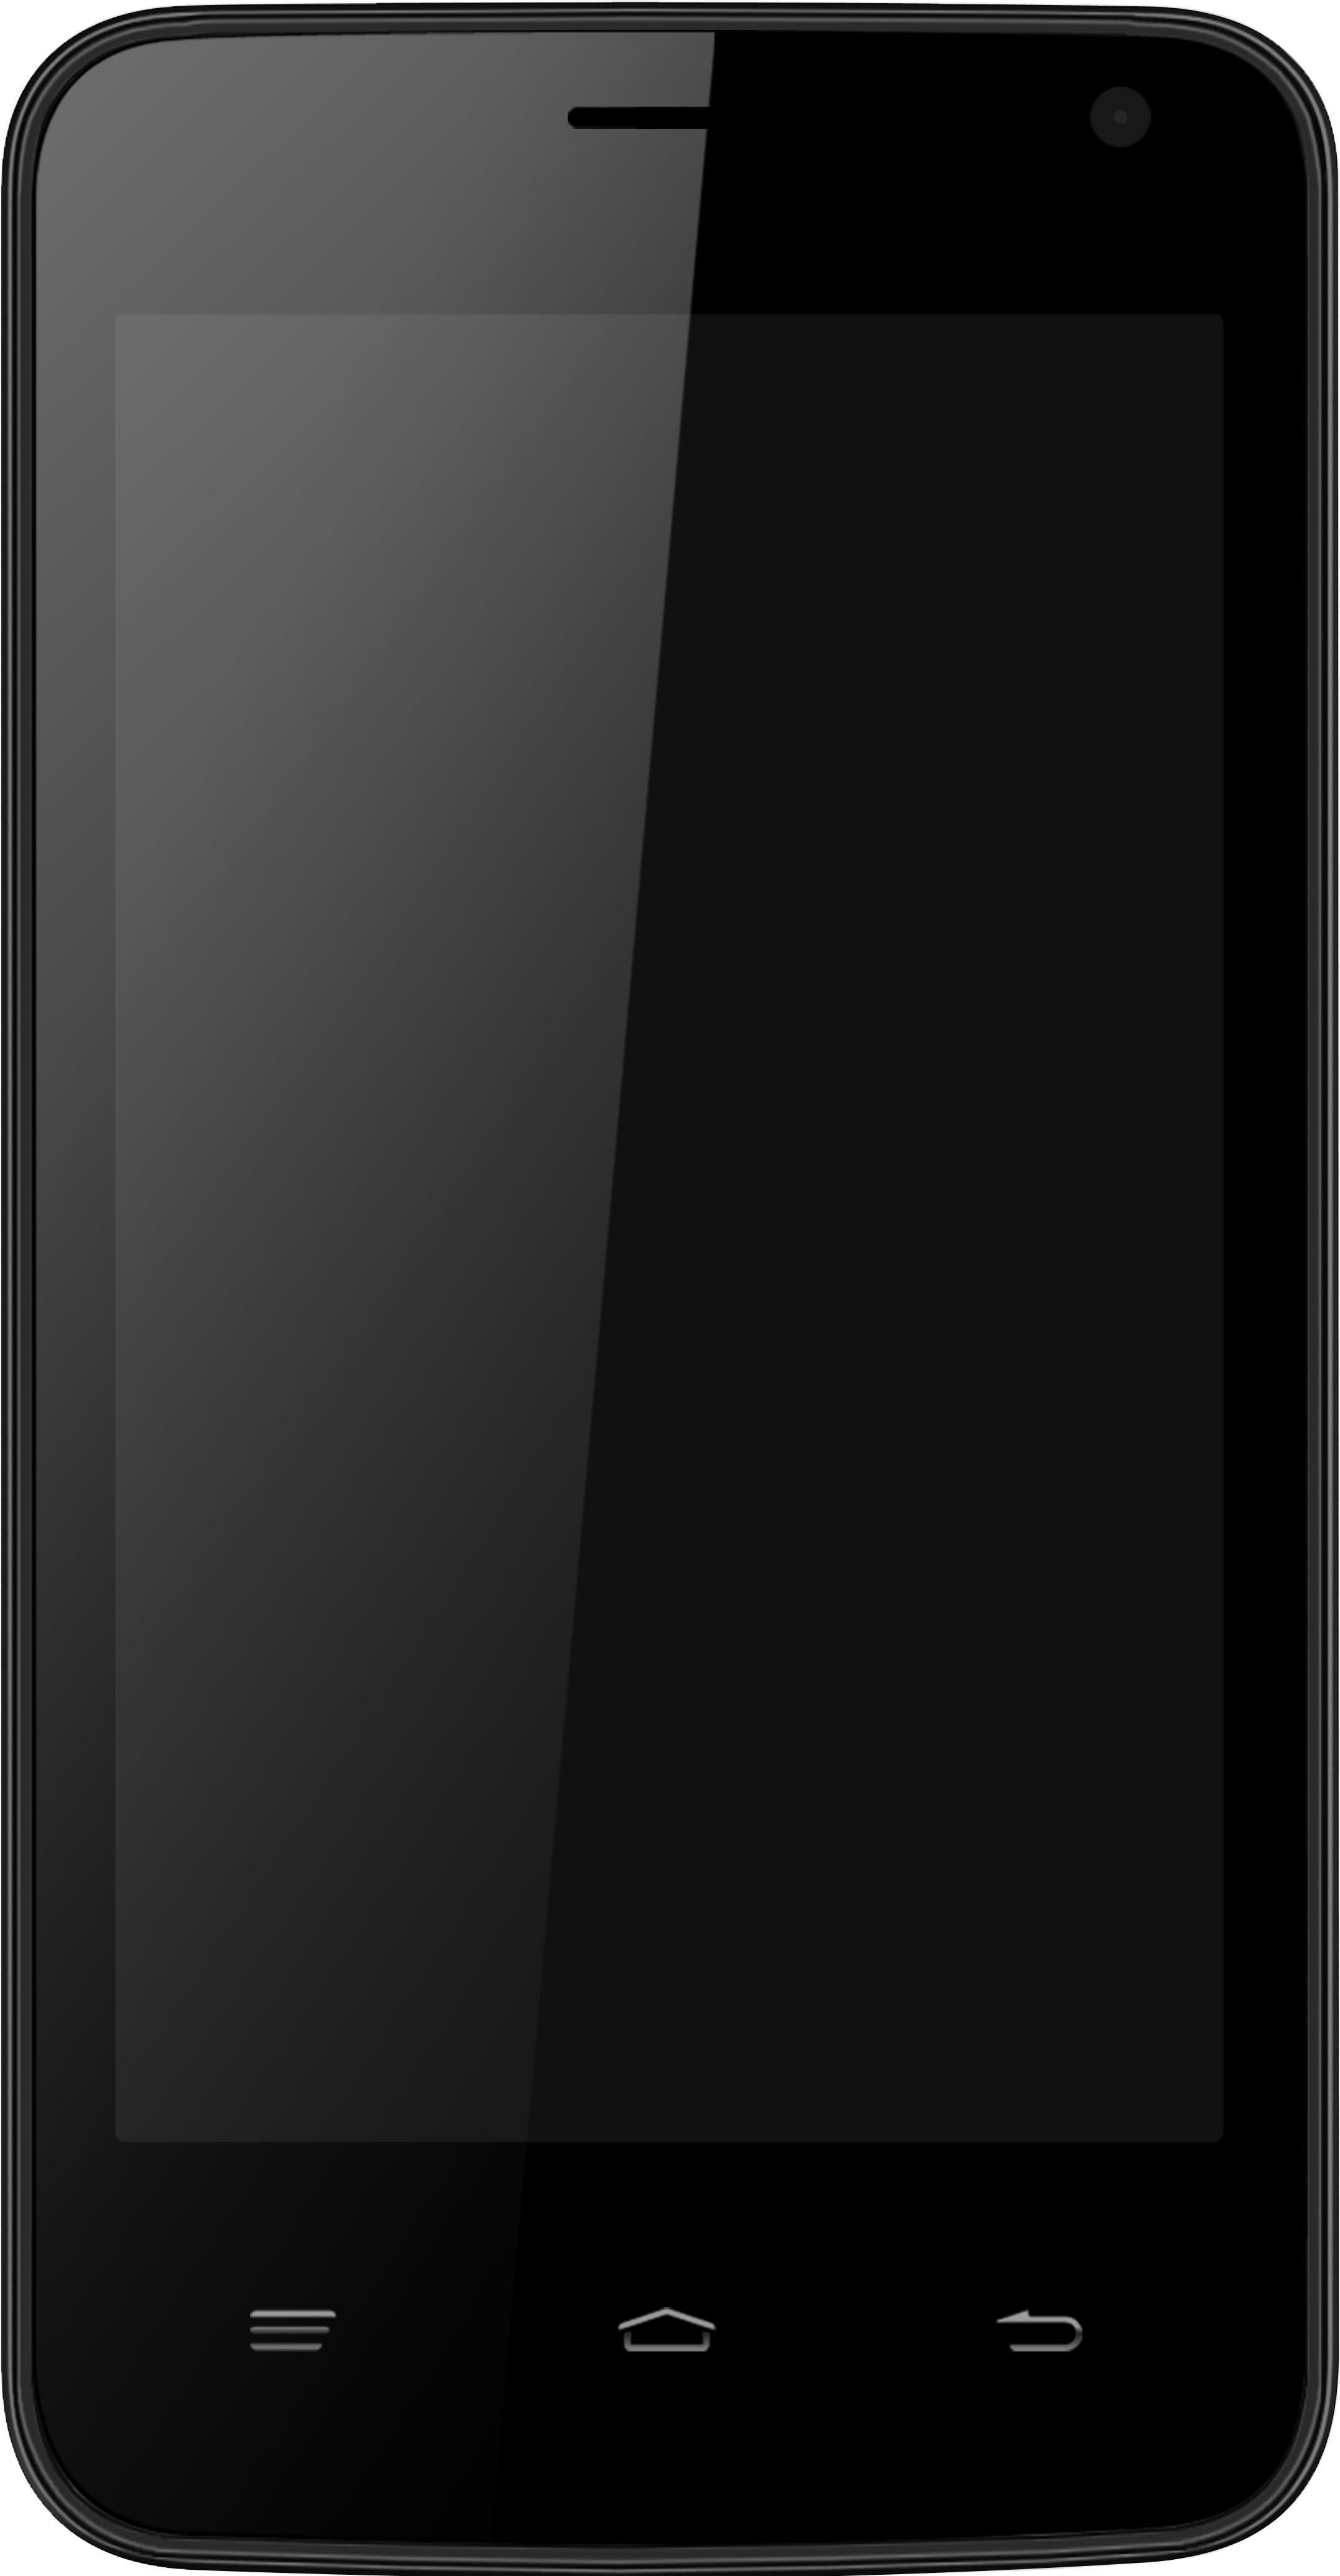 Intex Cloud Swing (Black, 512 MB)(256 MB RAM)